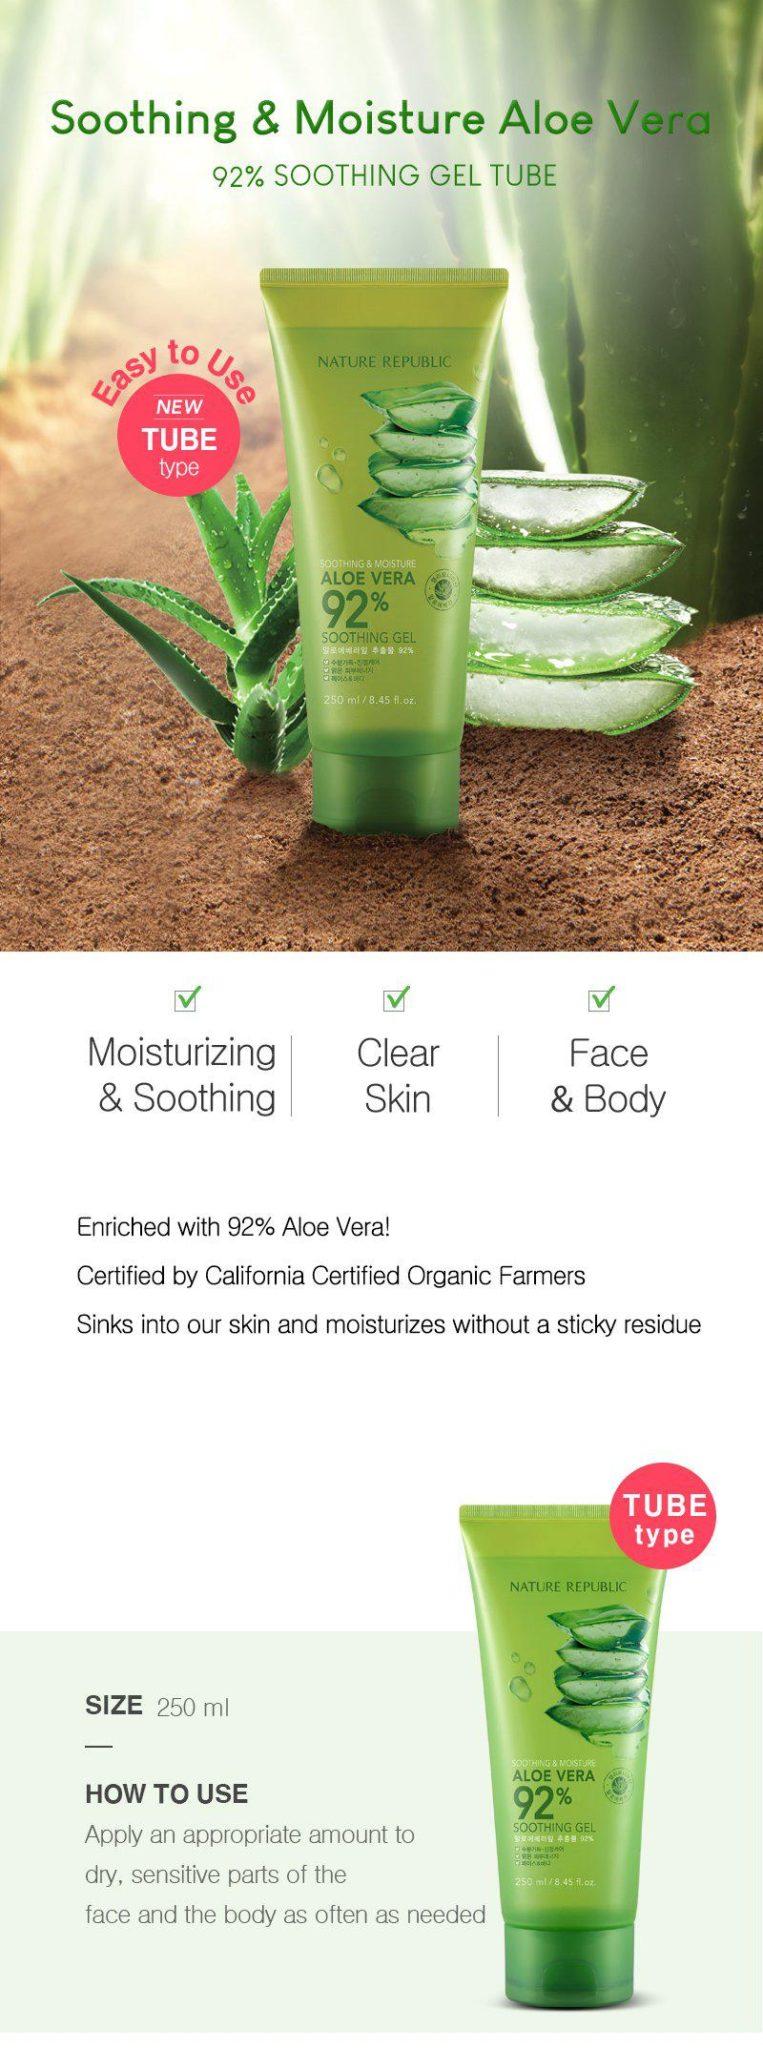 Nature Republic Soothing & Moisture Aloe Vera Gel 92%